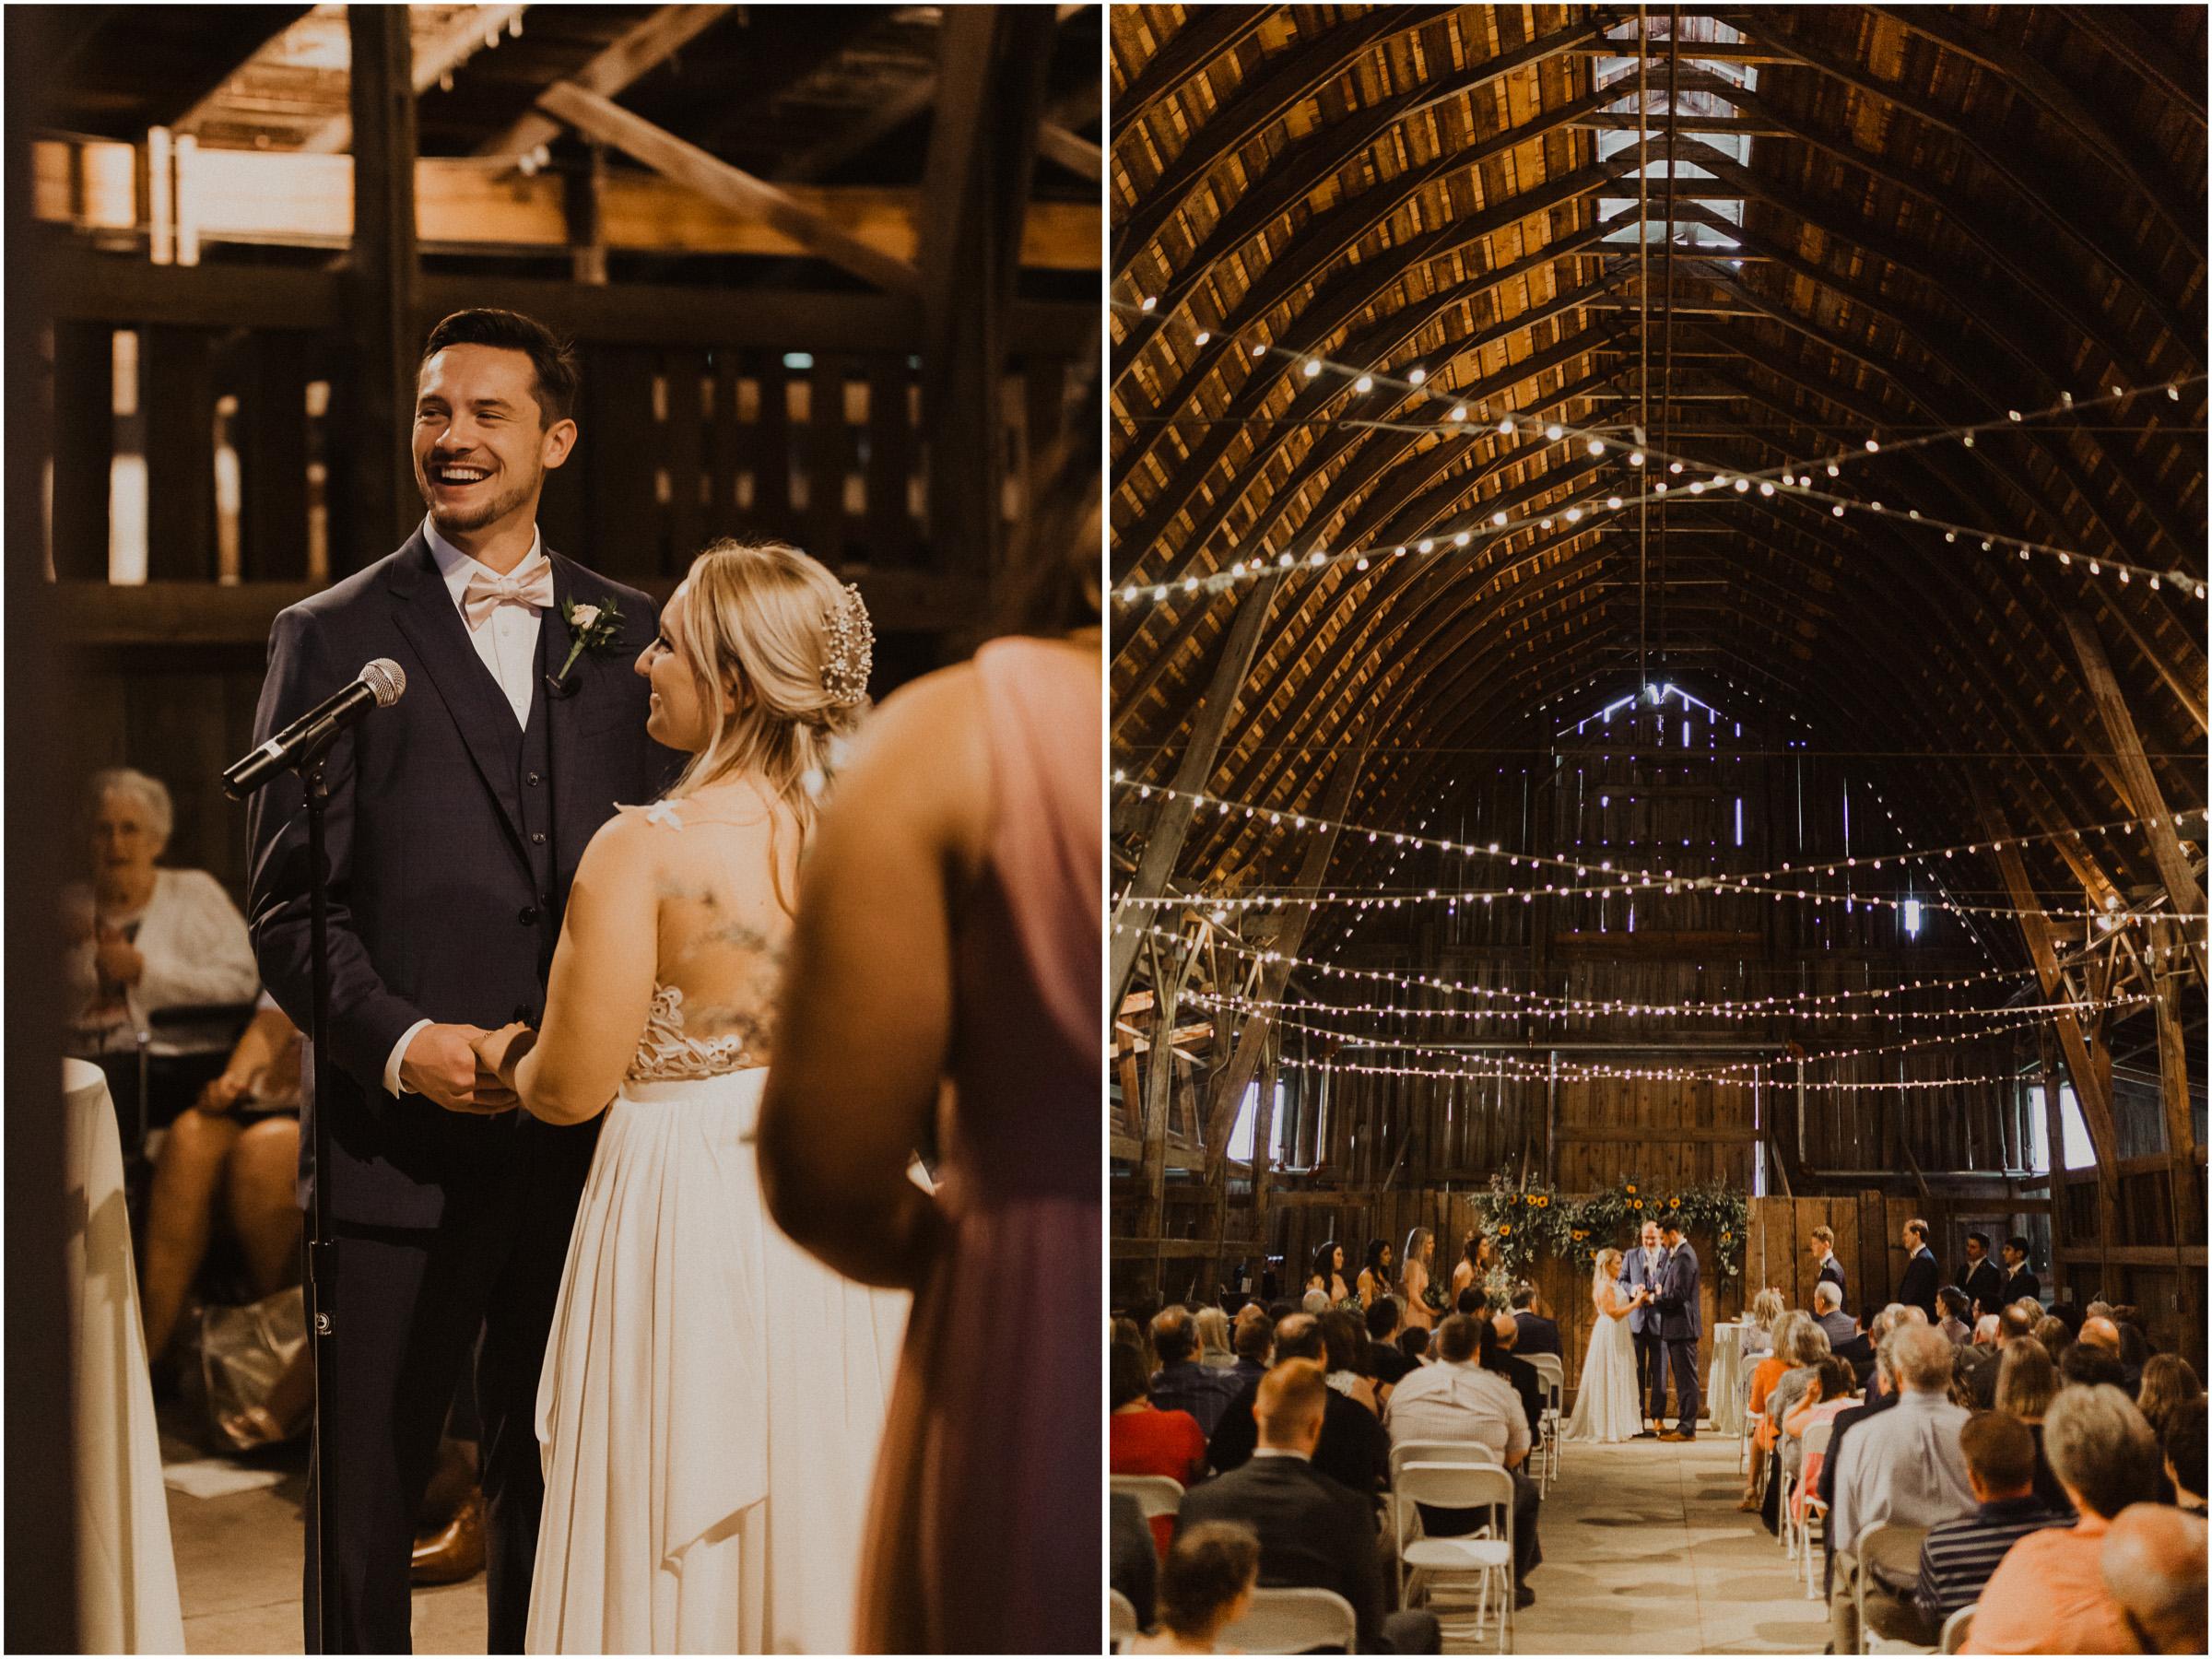 alyssa barletter photography nelson wedding nebraska city lied lodge morton barn spring wedding photographer-36.jpg